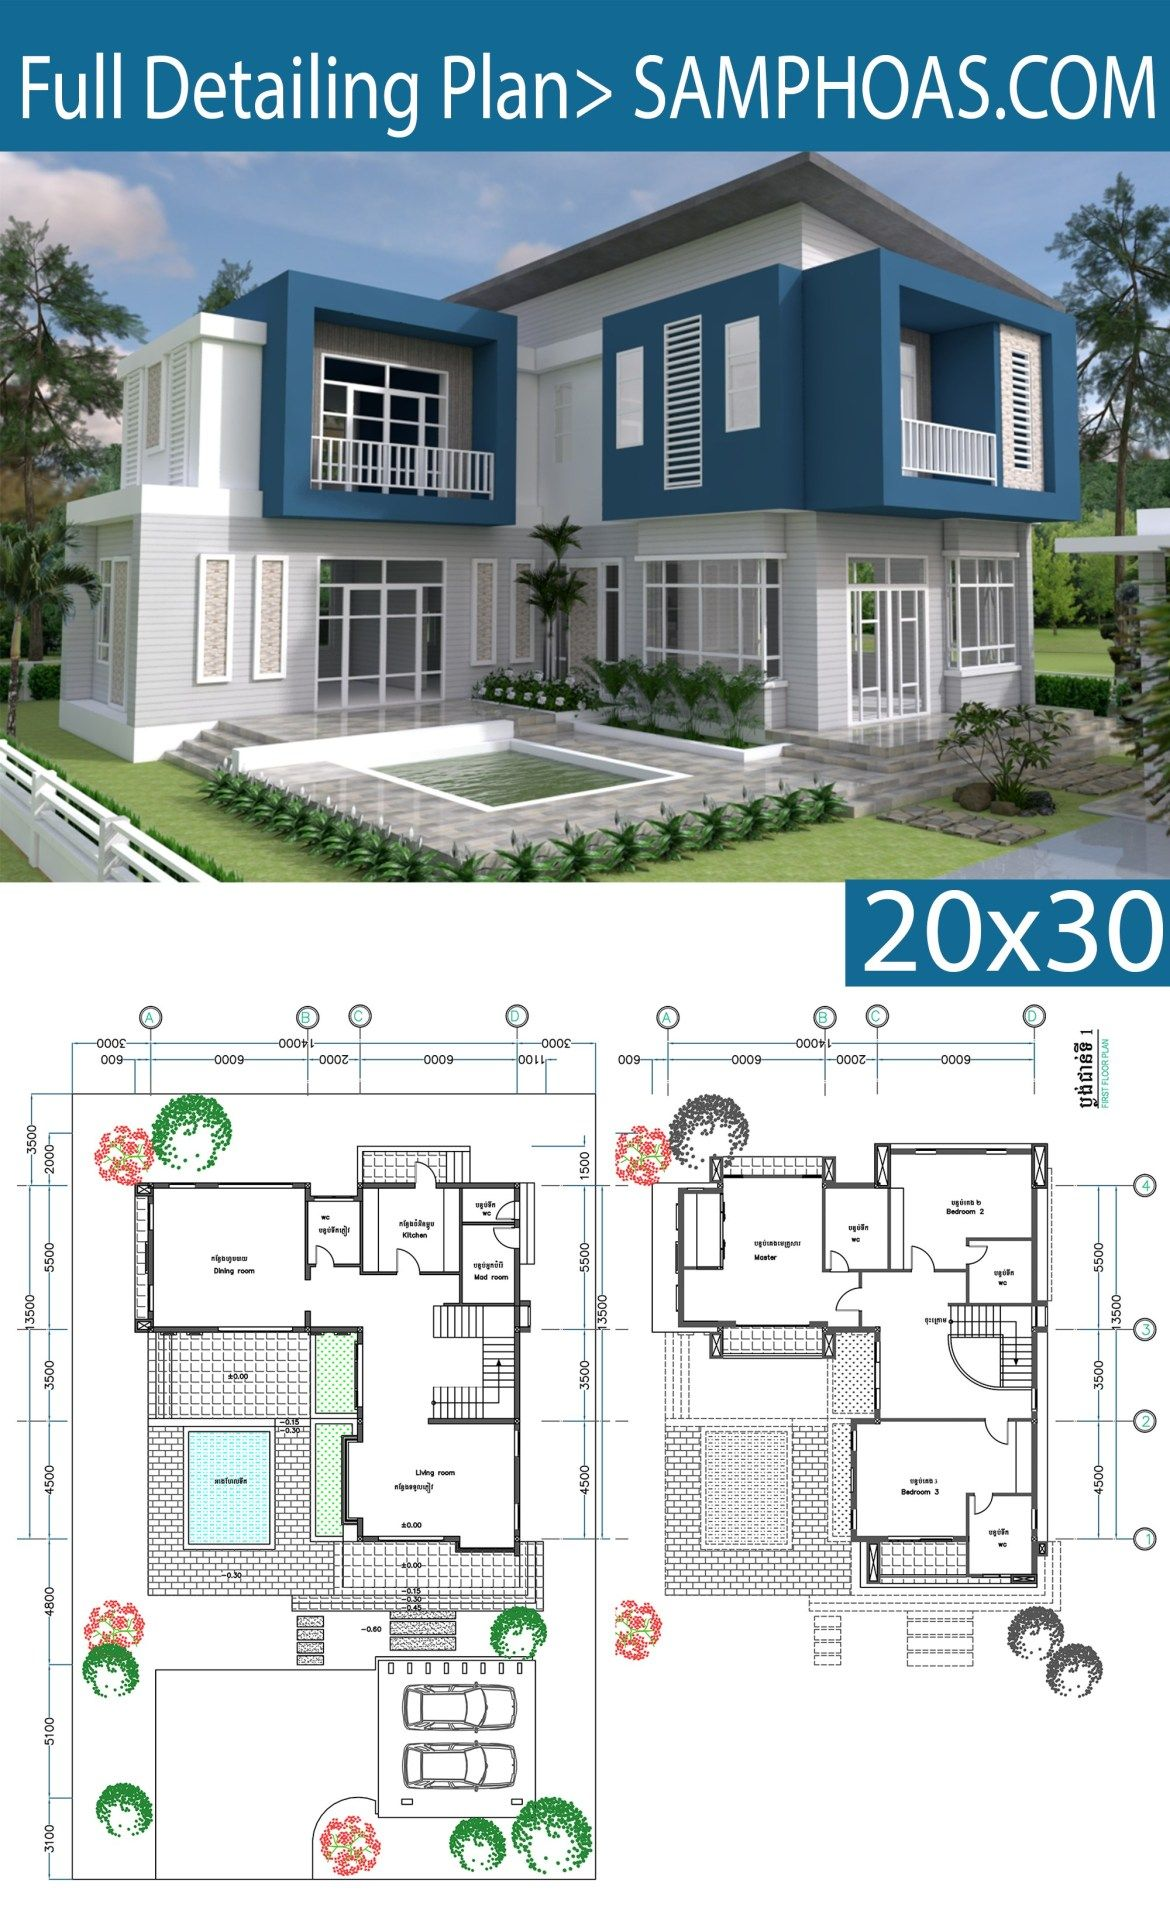 3 Bedrooms Modern Home Plan 14x13 5m Samphoas Plansearch Modern House Plans House Plans Modern House Design